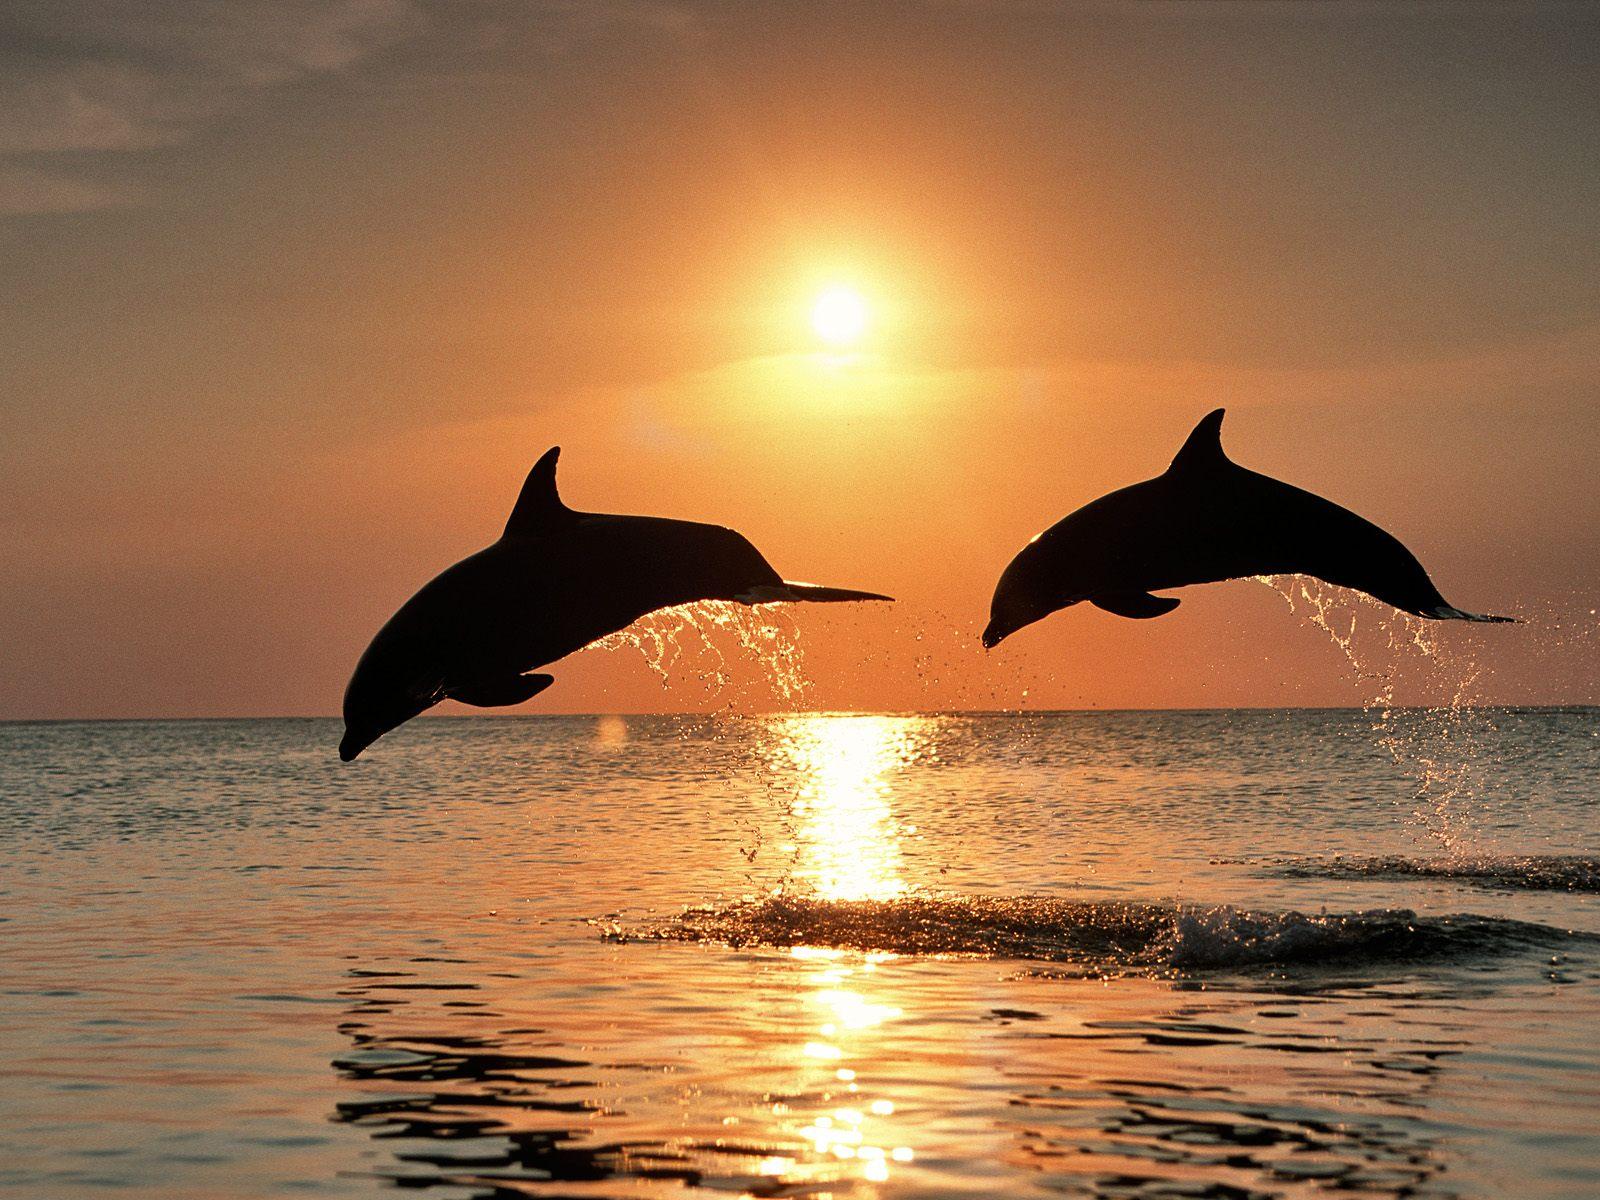 http://2.bp.blogspot.com/-vfagY6WxfVE/UC5HO_zZryI/AAAAAAAAEwQ/ngy0AkVxvzw/s1600/The-best-top-desktop-dolphin-wallpapers-hd-dolphins-wallpaper-2.jpg